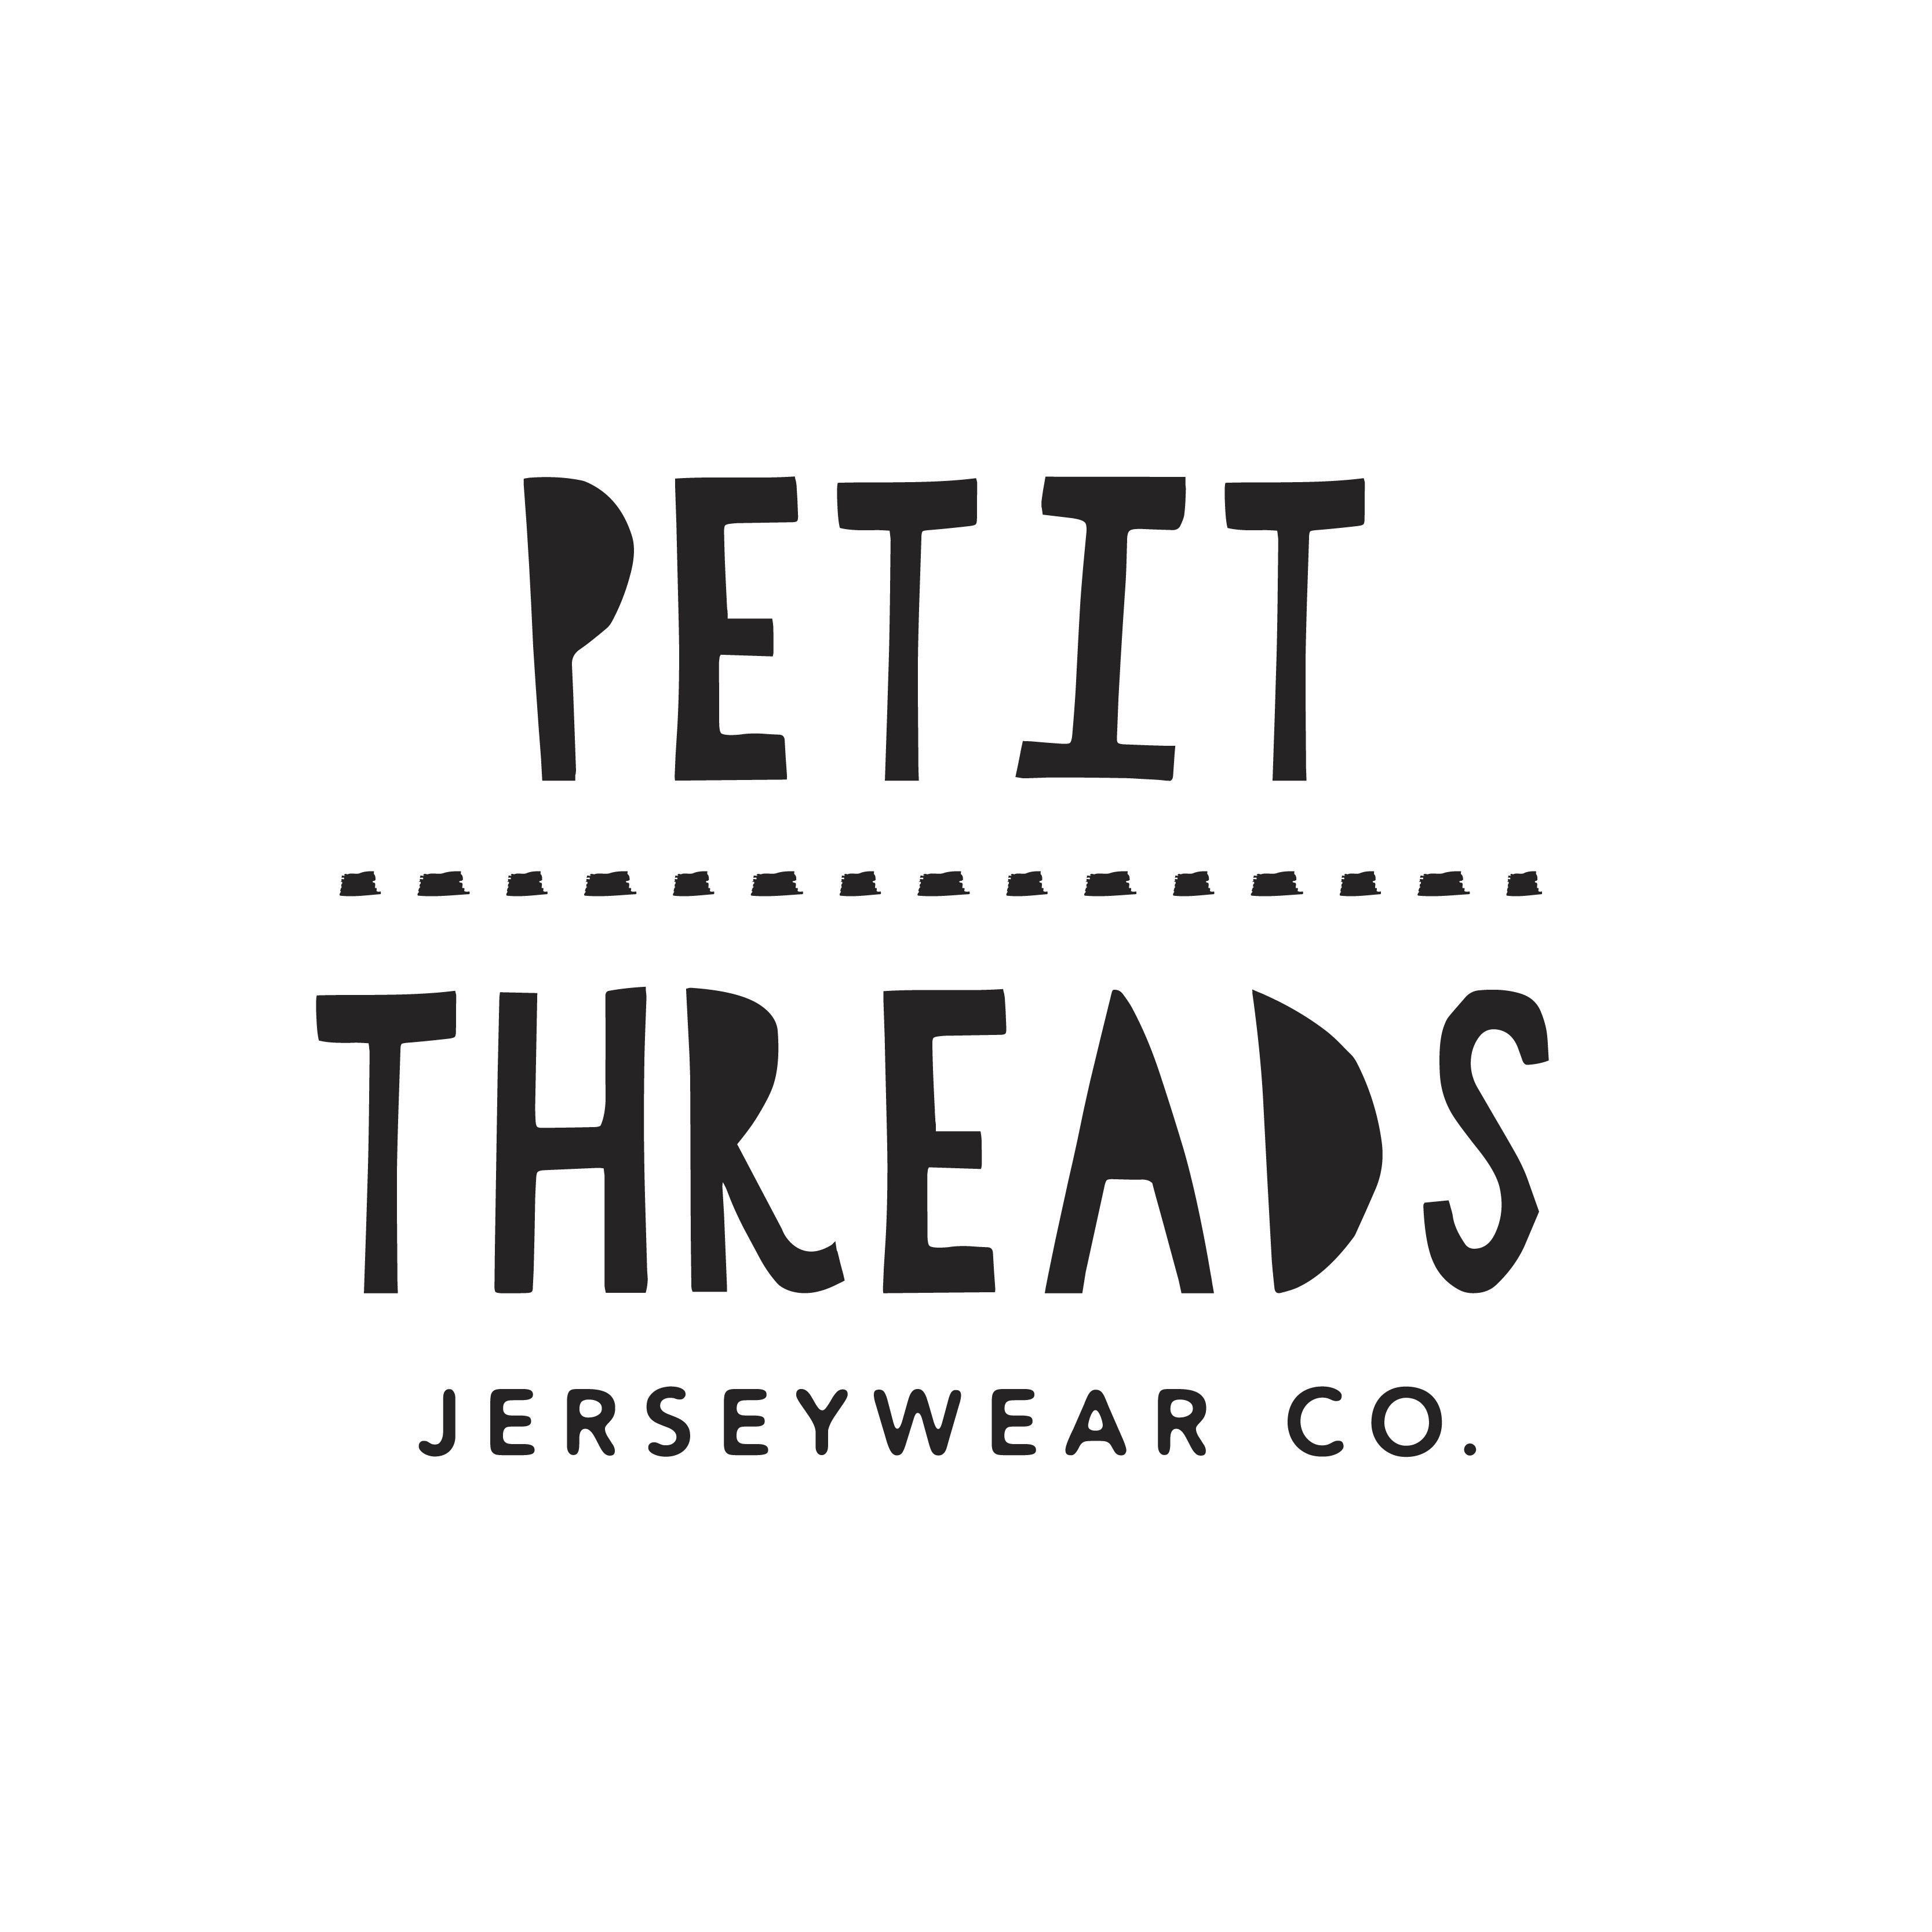 Childrenswear brand logo